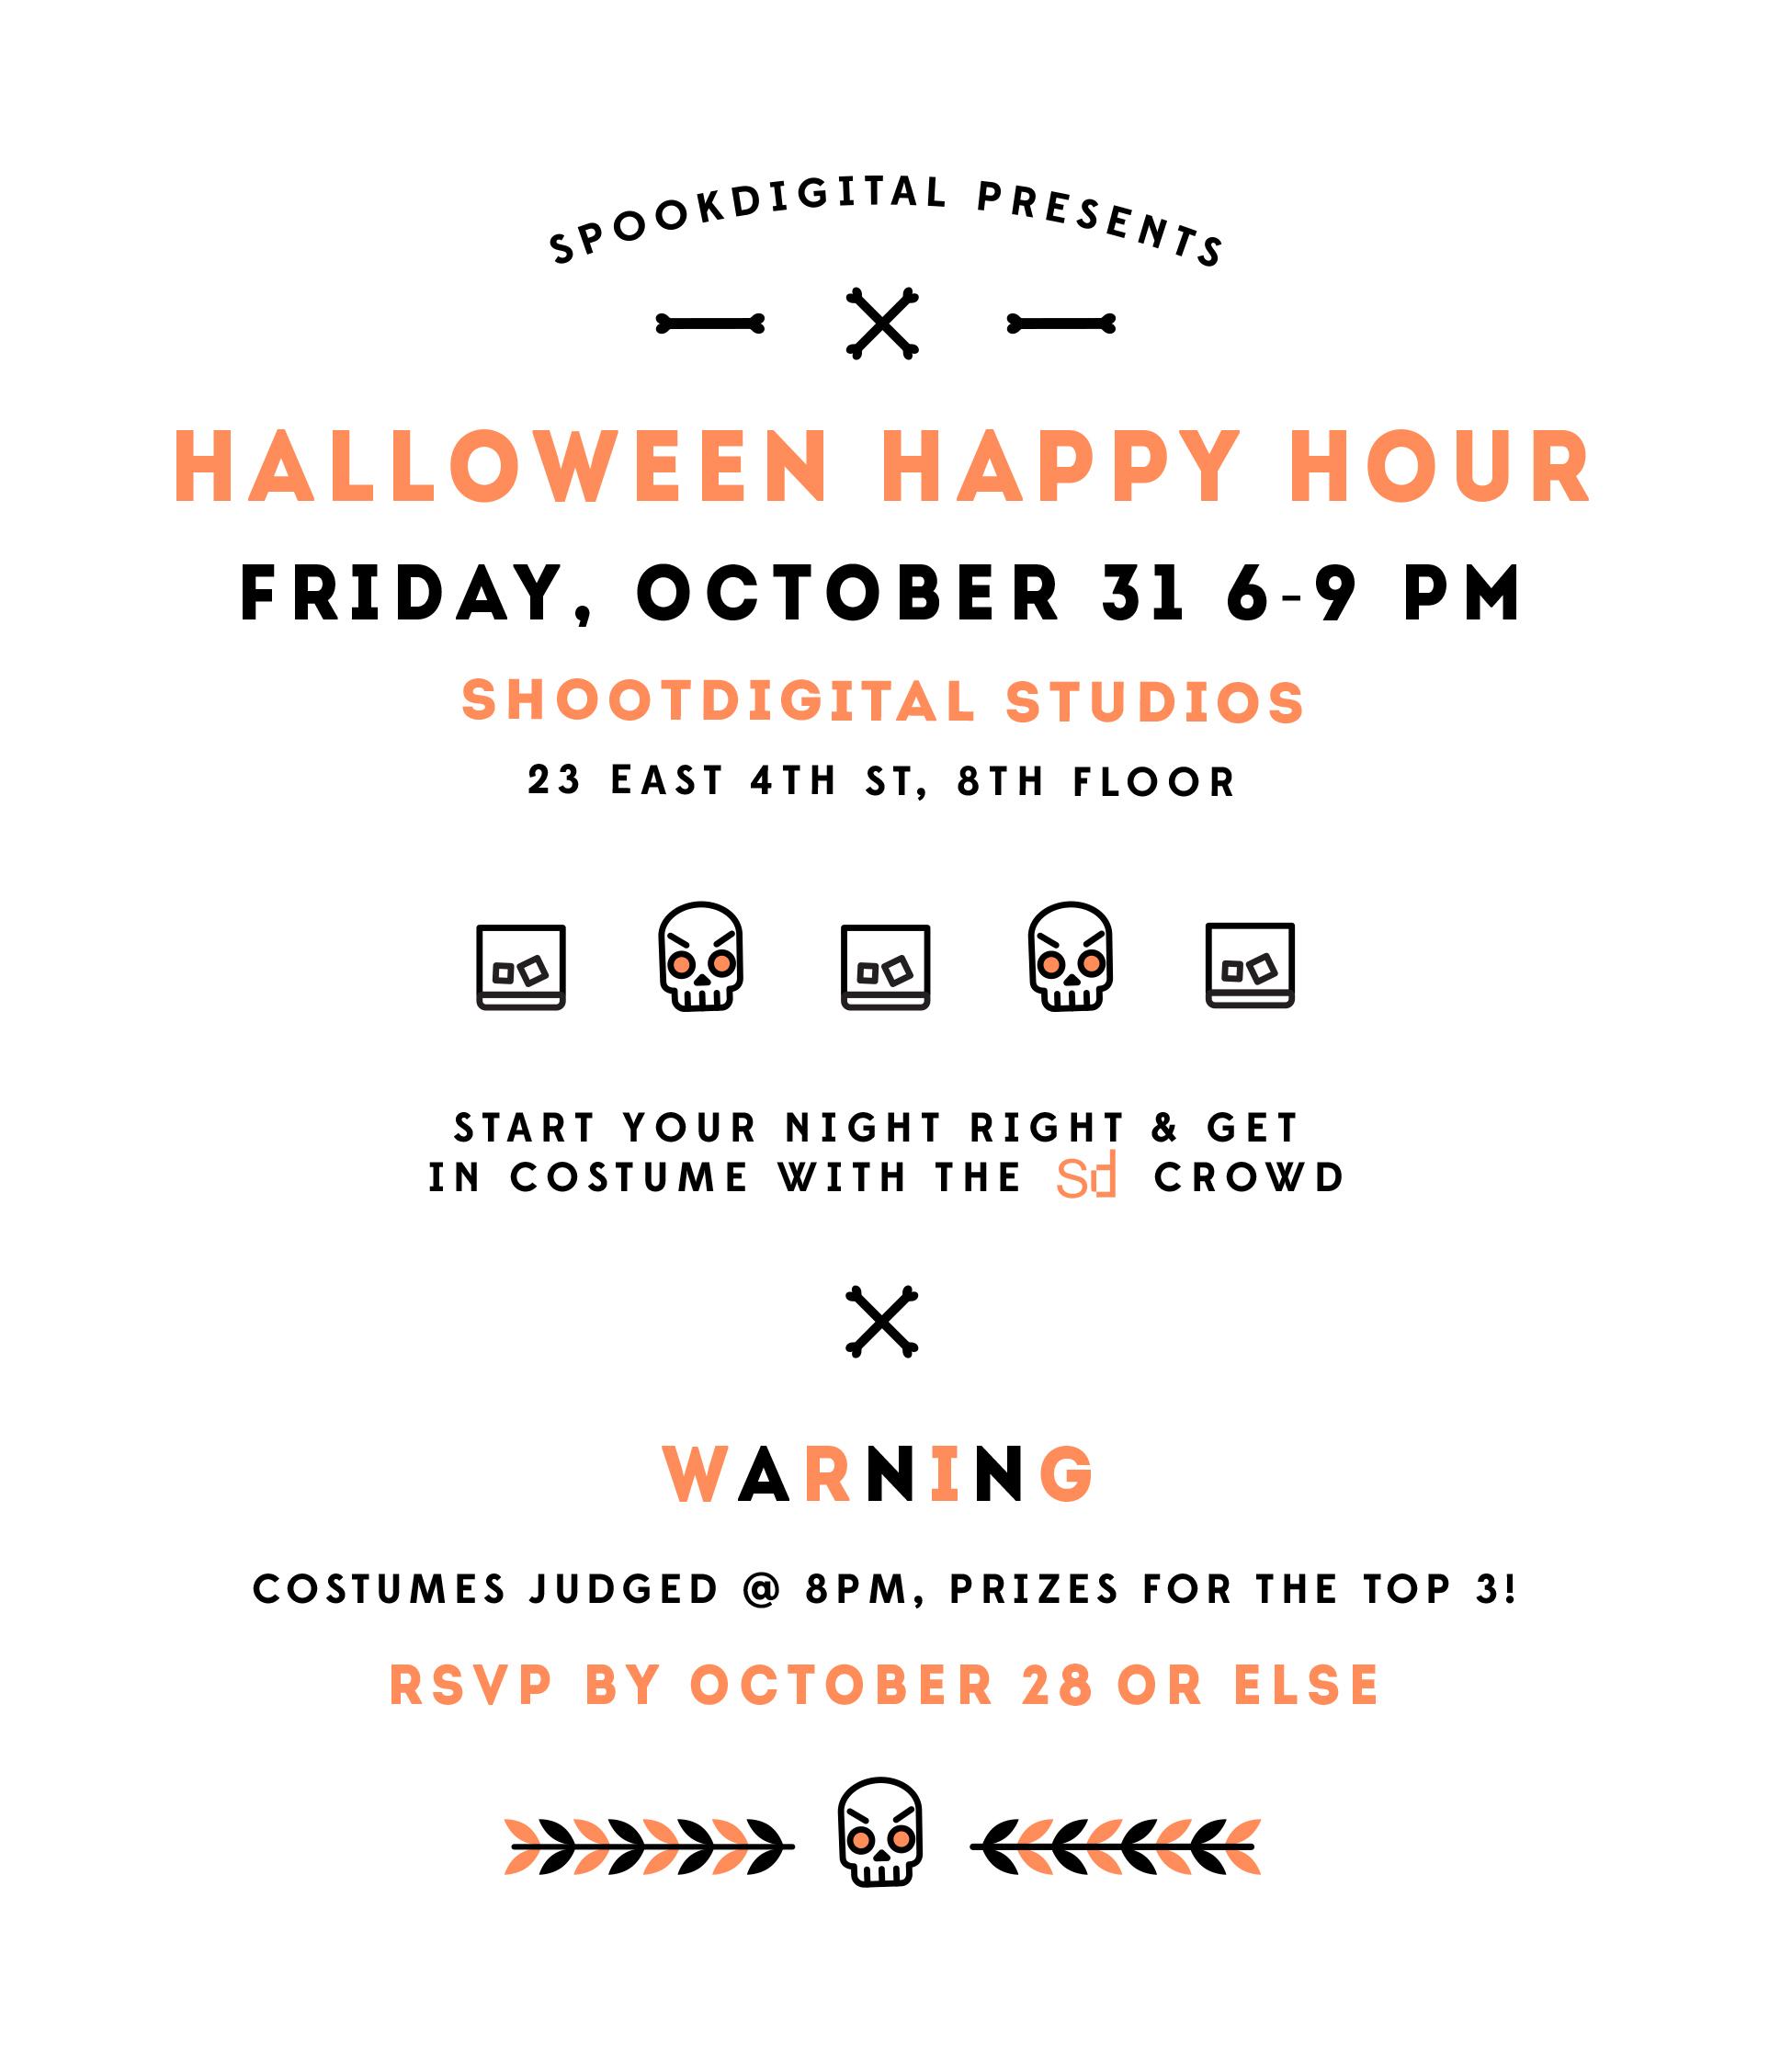 Invitation designed for  shootdigital